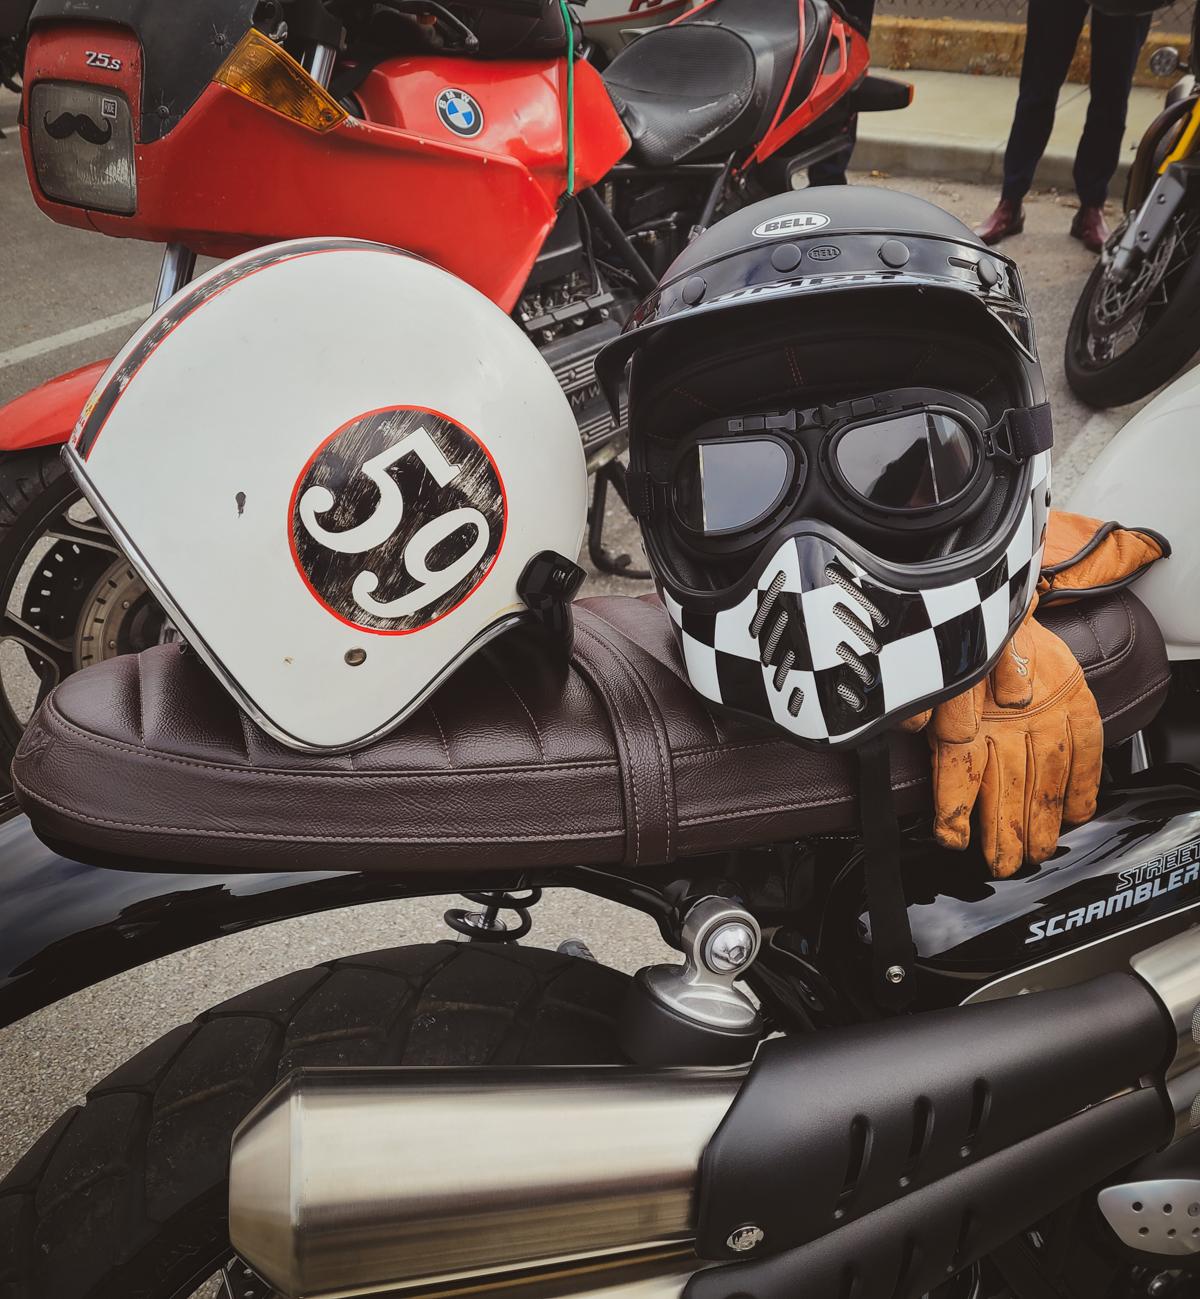 Dapper Ride for Gentlefolk |  September 27, 2020 | Indianapolis, IN. | Photo Credit: ©Pix Meyers 202020200927-DGR-IndianapolisIN-PixMeyers-29